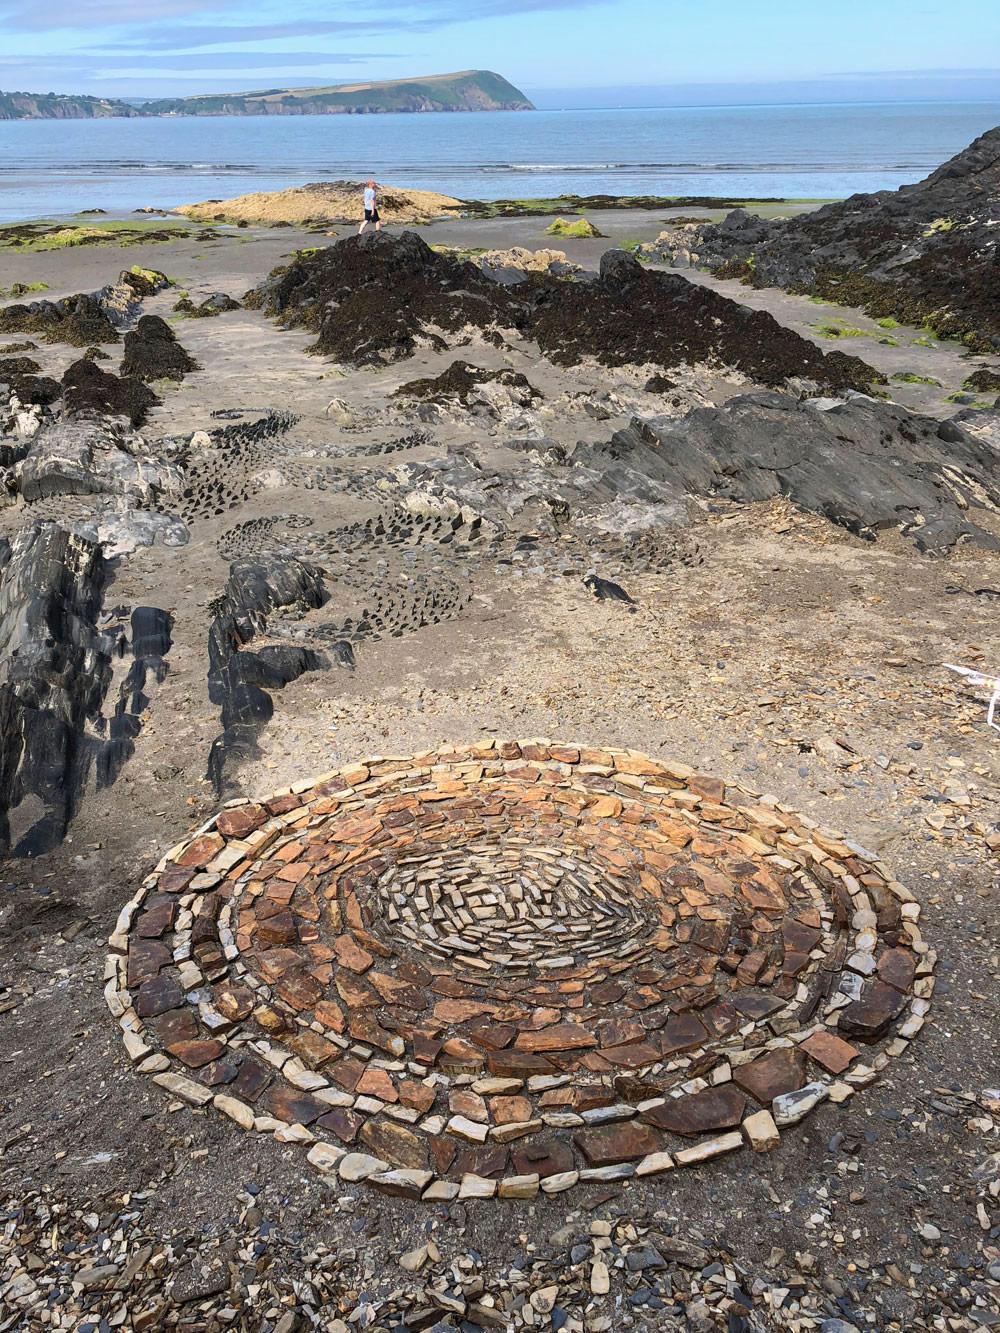 Stone Circle Drawing Newport Sands, Pembrokeshire, July 2018